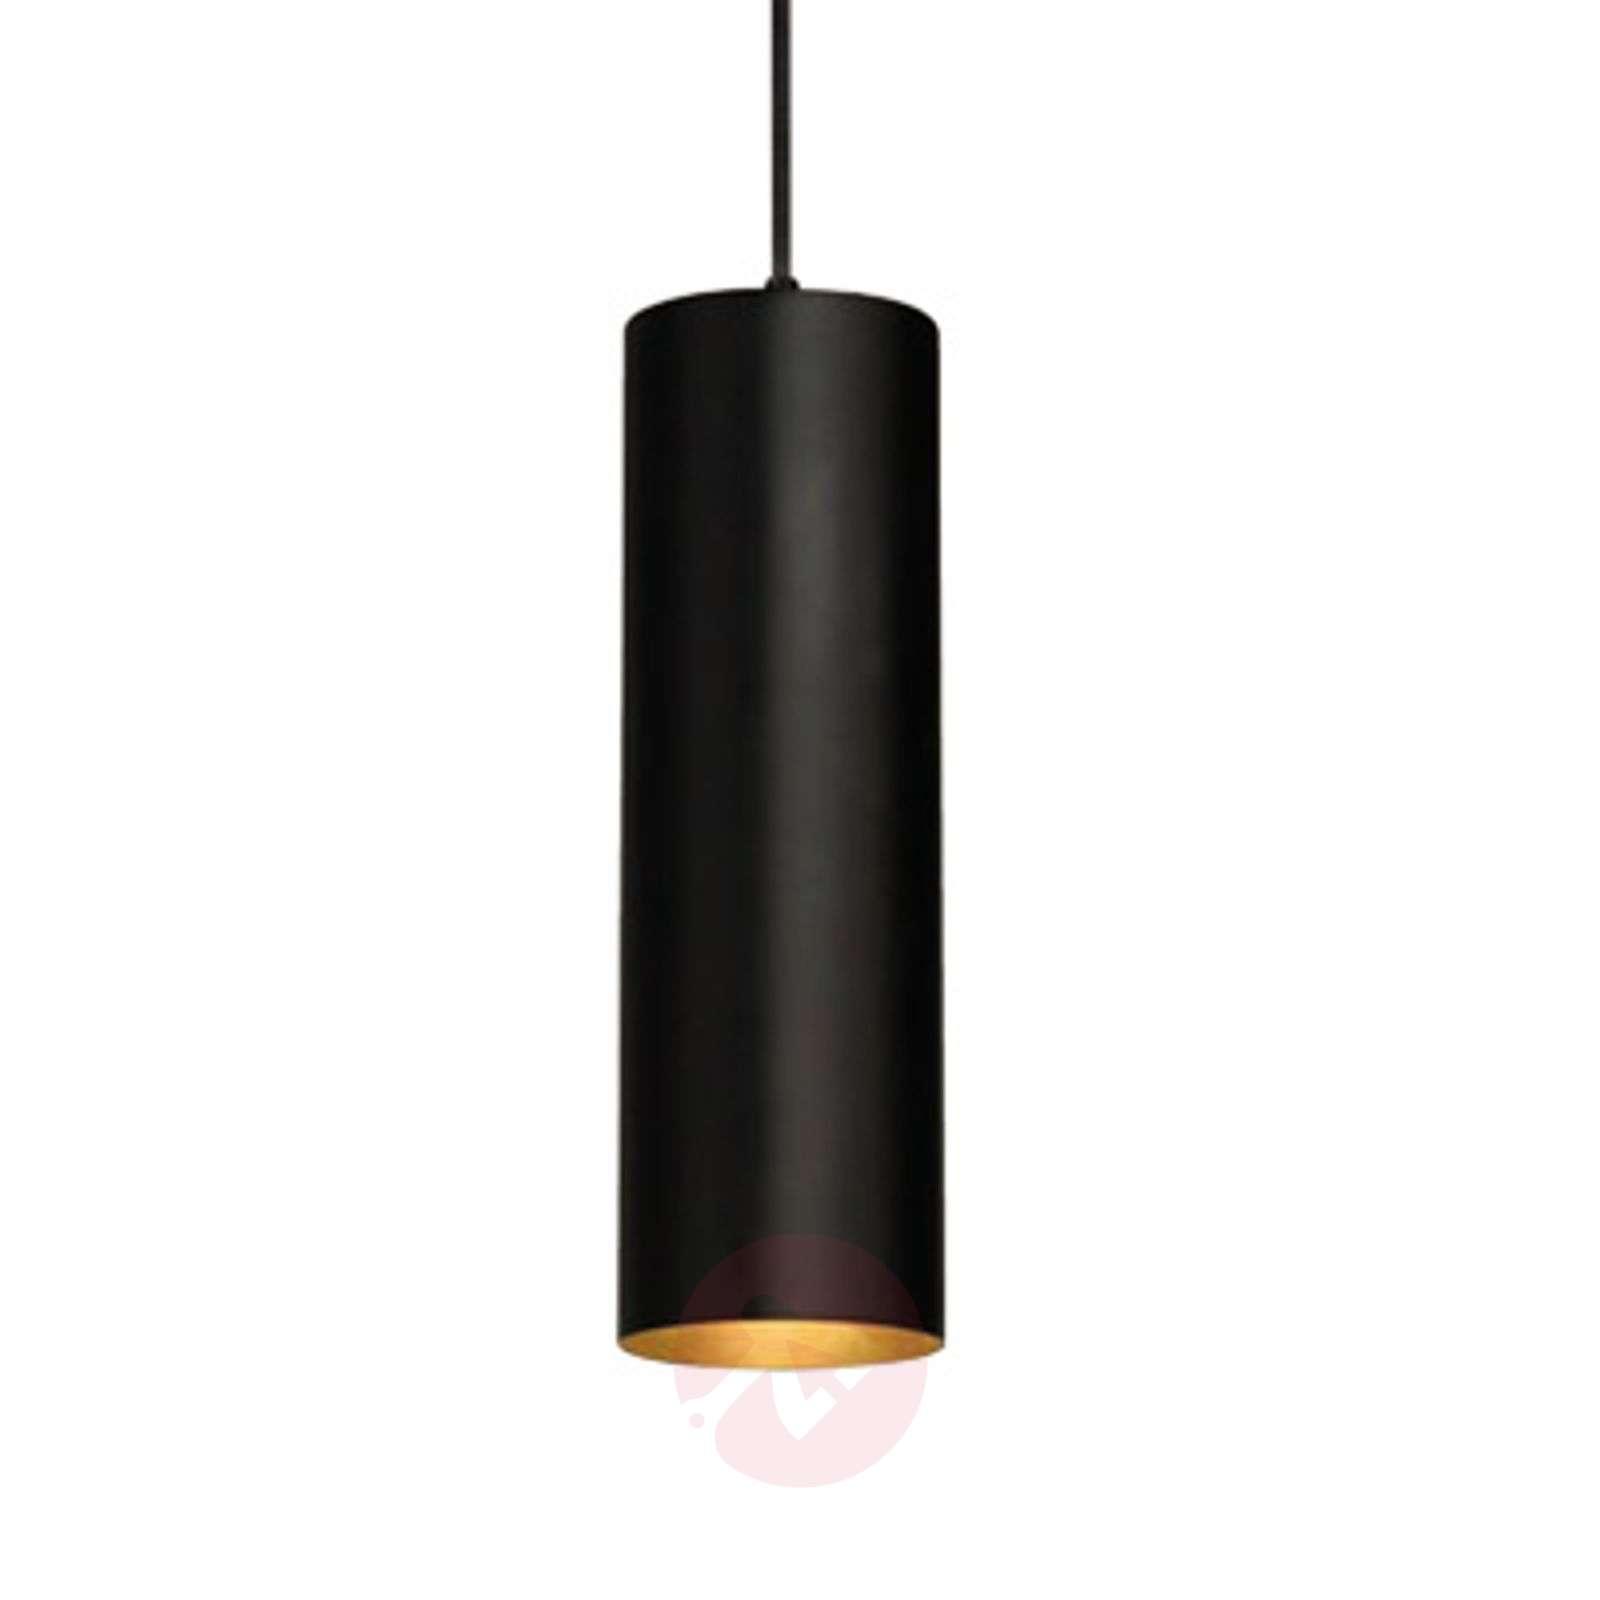 SLV Enola riippuvalaisin musta-5504514-01